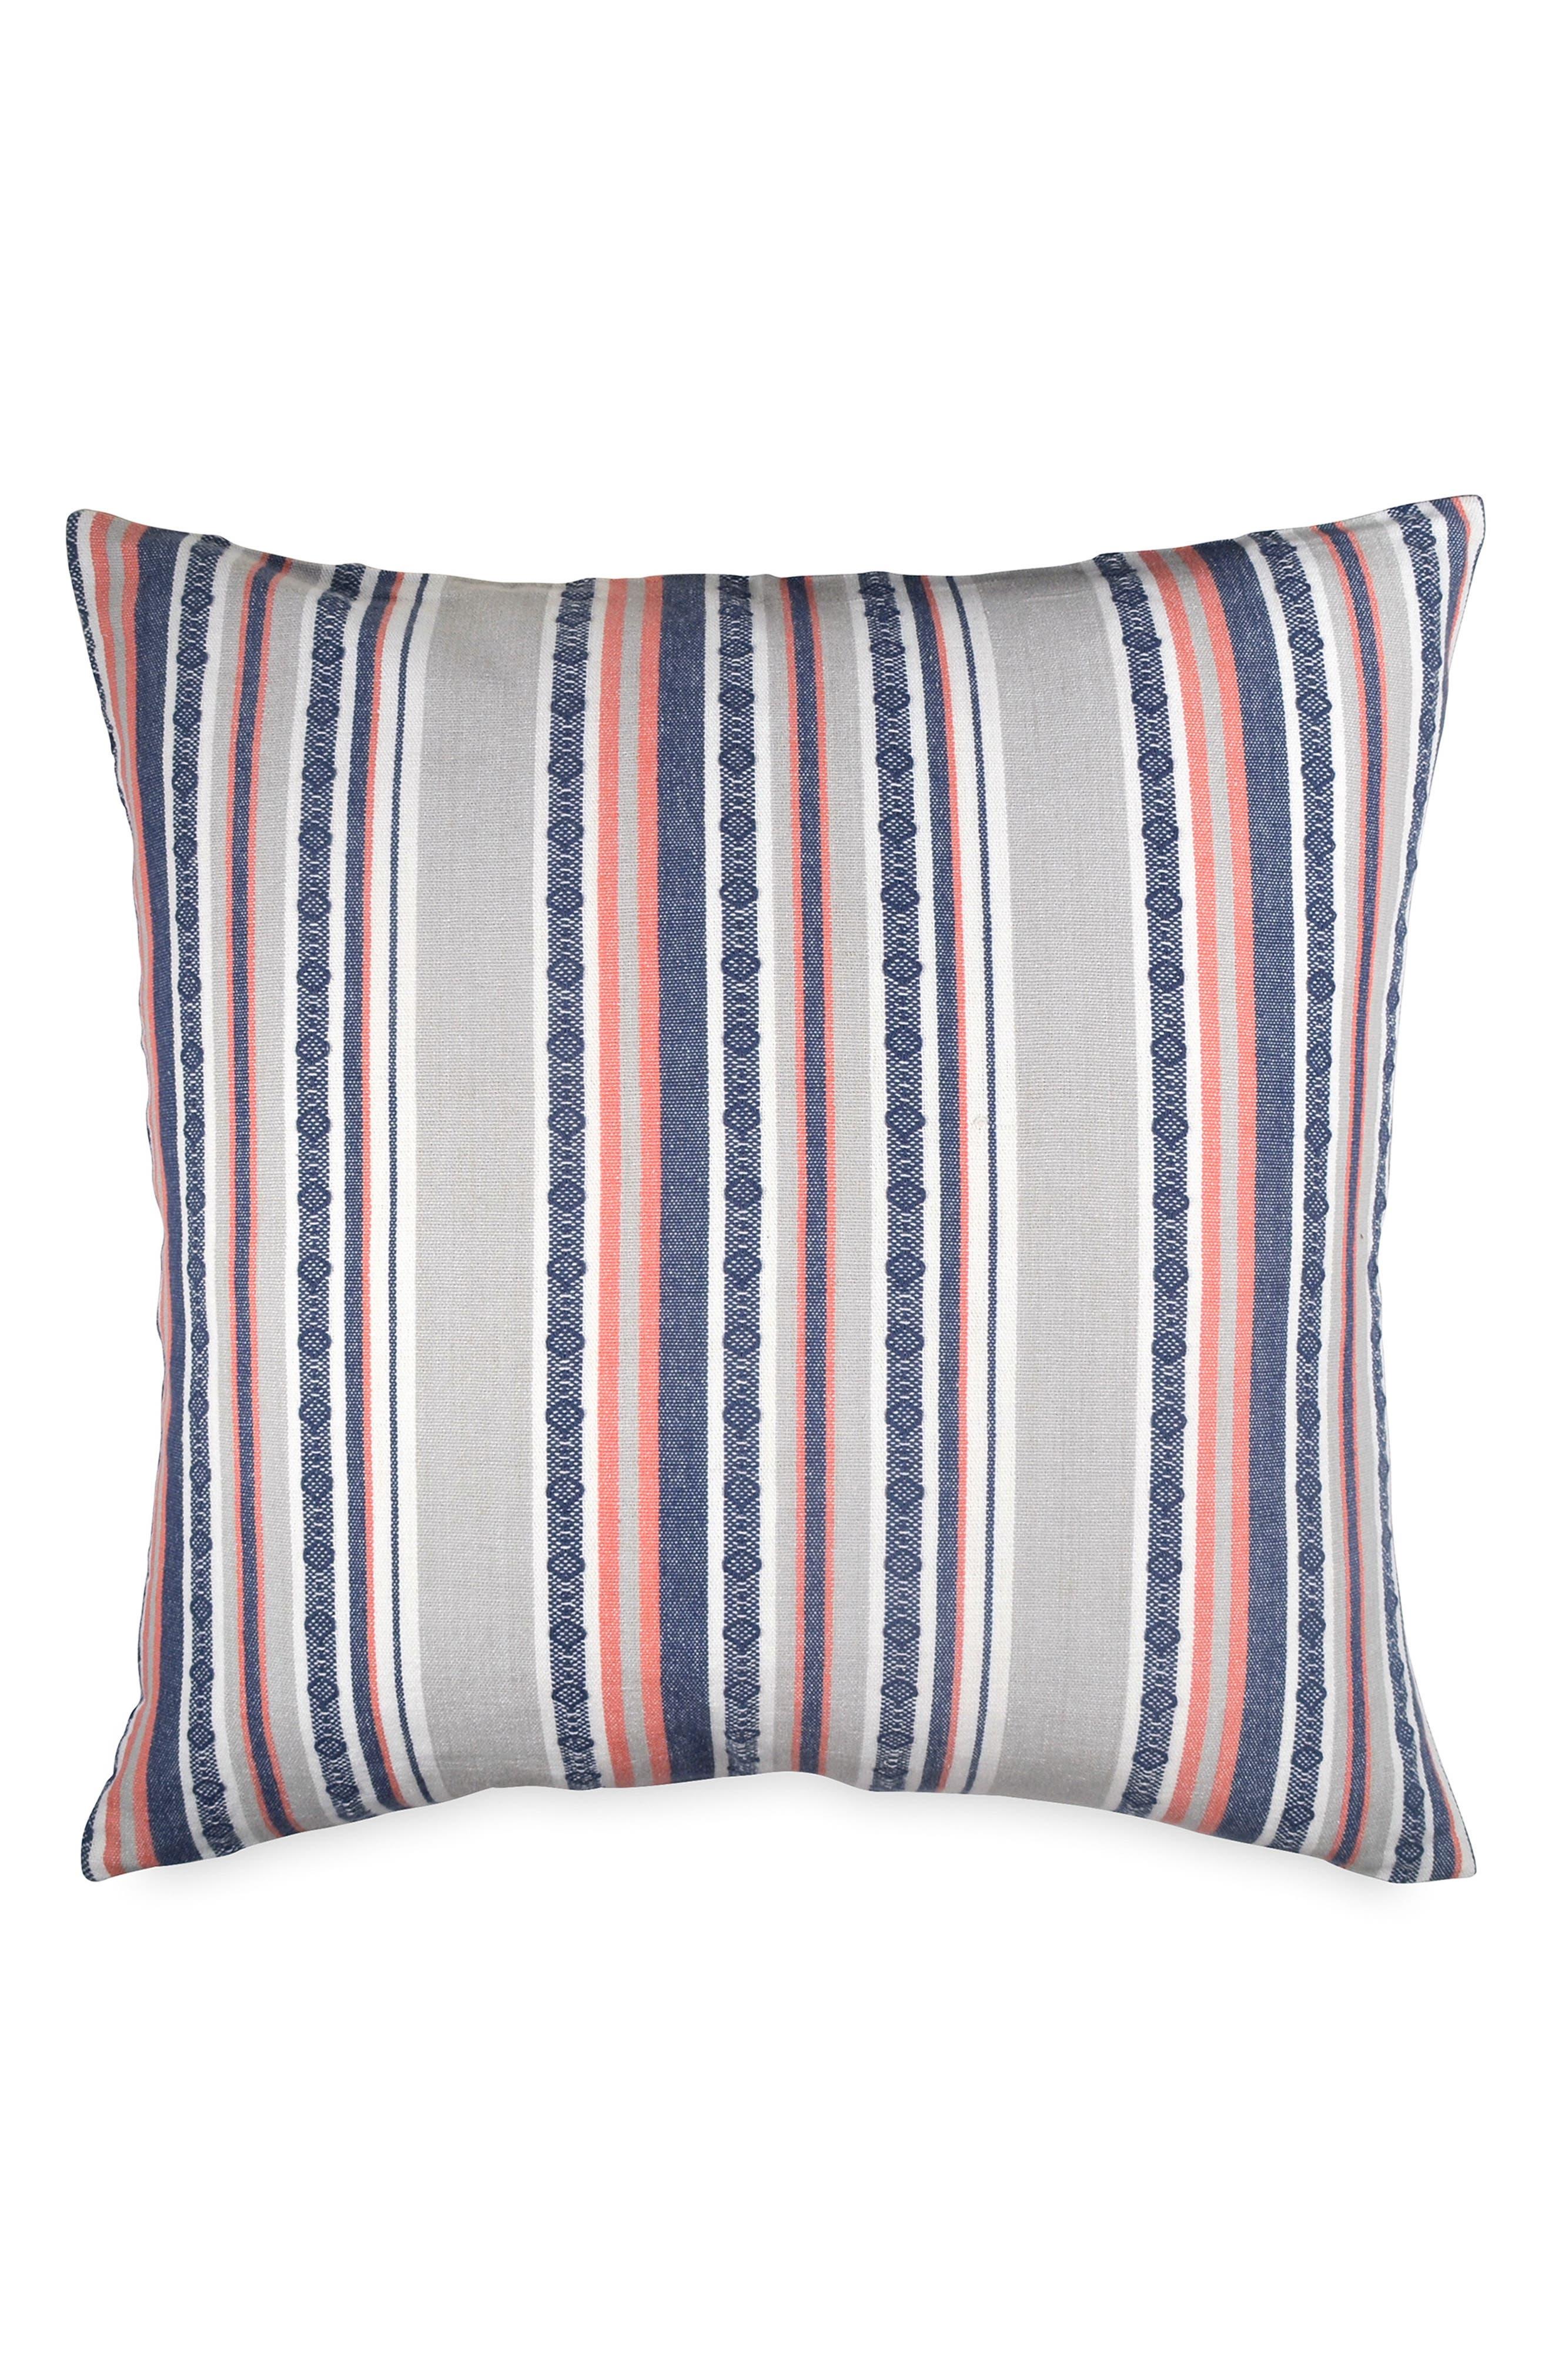 Woven Accent Pillow,                             Main thumbnail 1, color,                             020